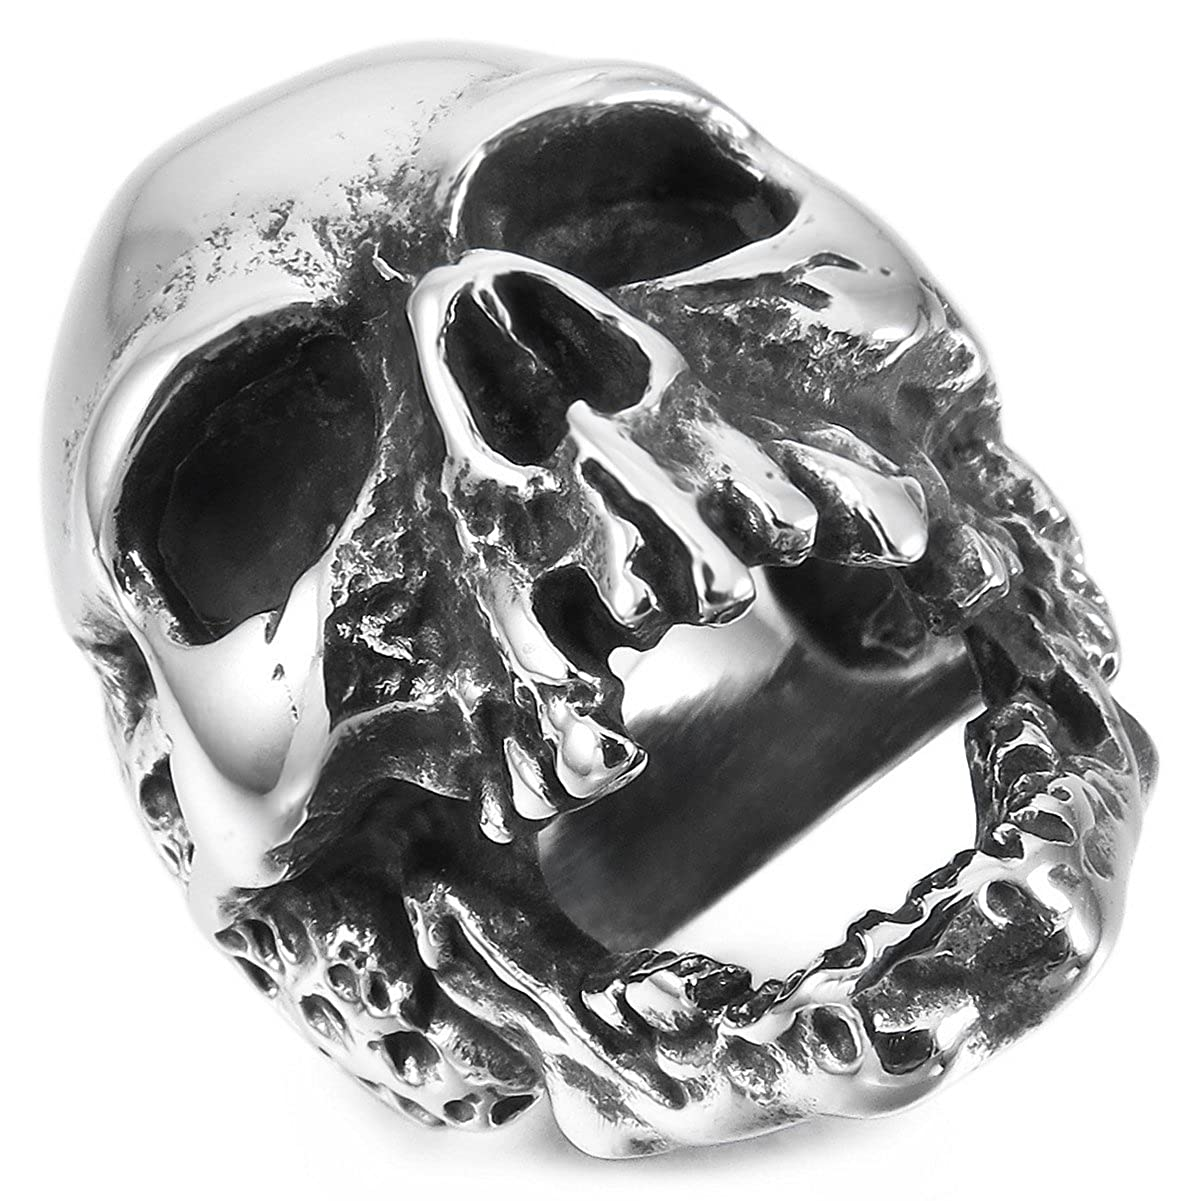 MunkiMix Grande Gran Acero Inoxidable Anillo Ring El Tono De Plata Cráneo Calavera Gótico Gothic Hombre ve963-parent